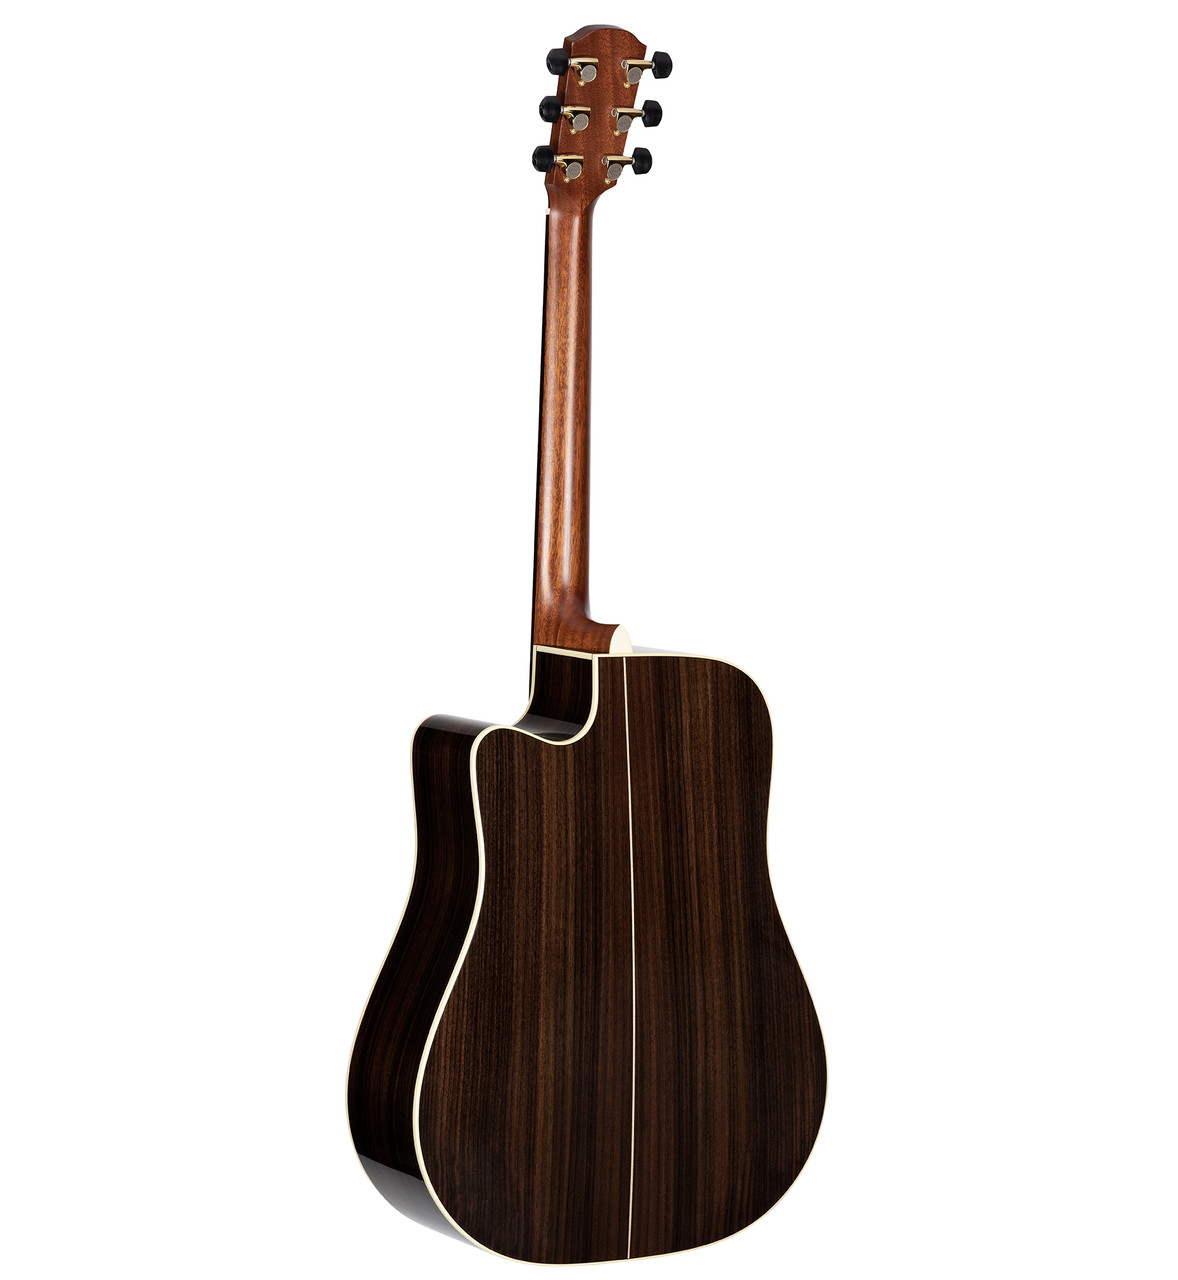 Alvarez Yairi DYM70CE Masterworks Dreadnought Acoustic Natural